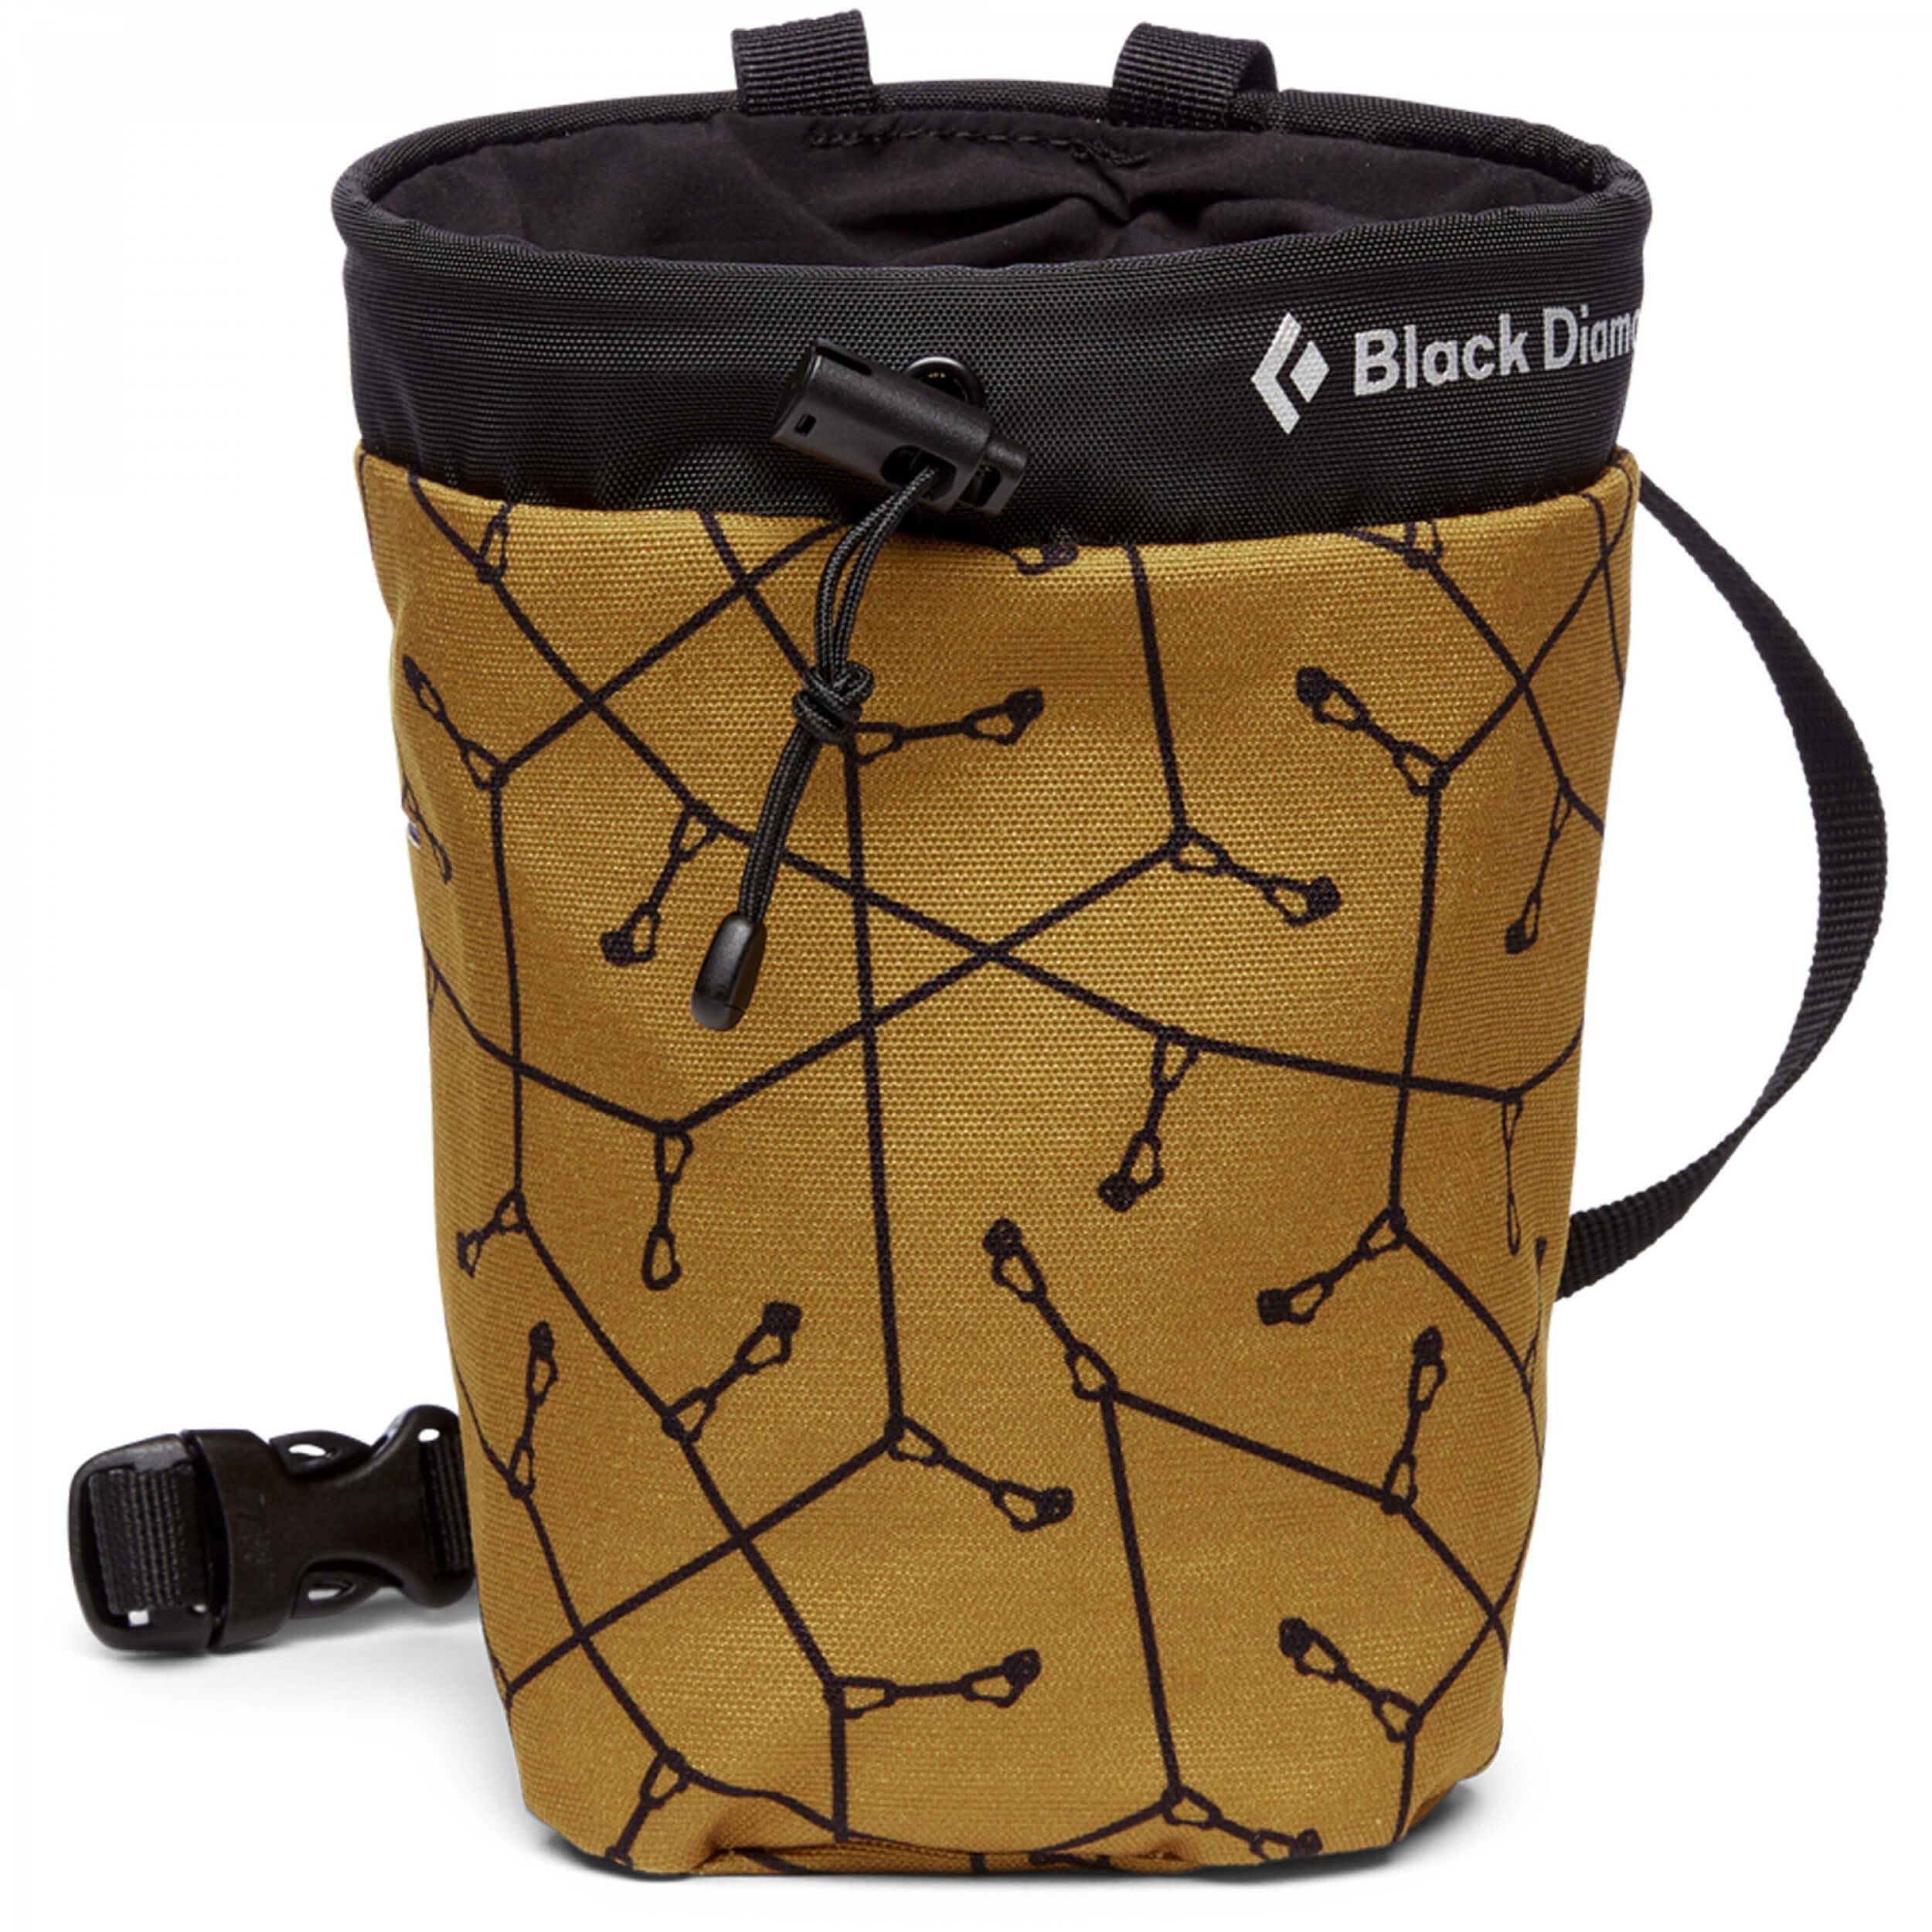 Black Diamond GYM Chalk Bag sport print